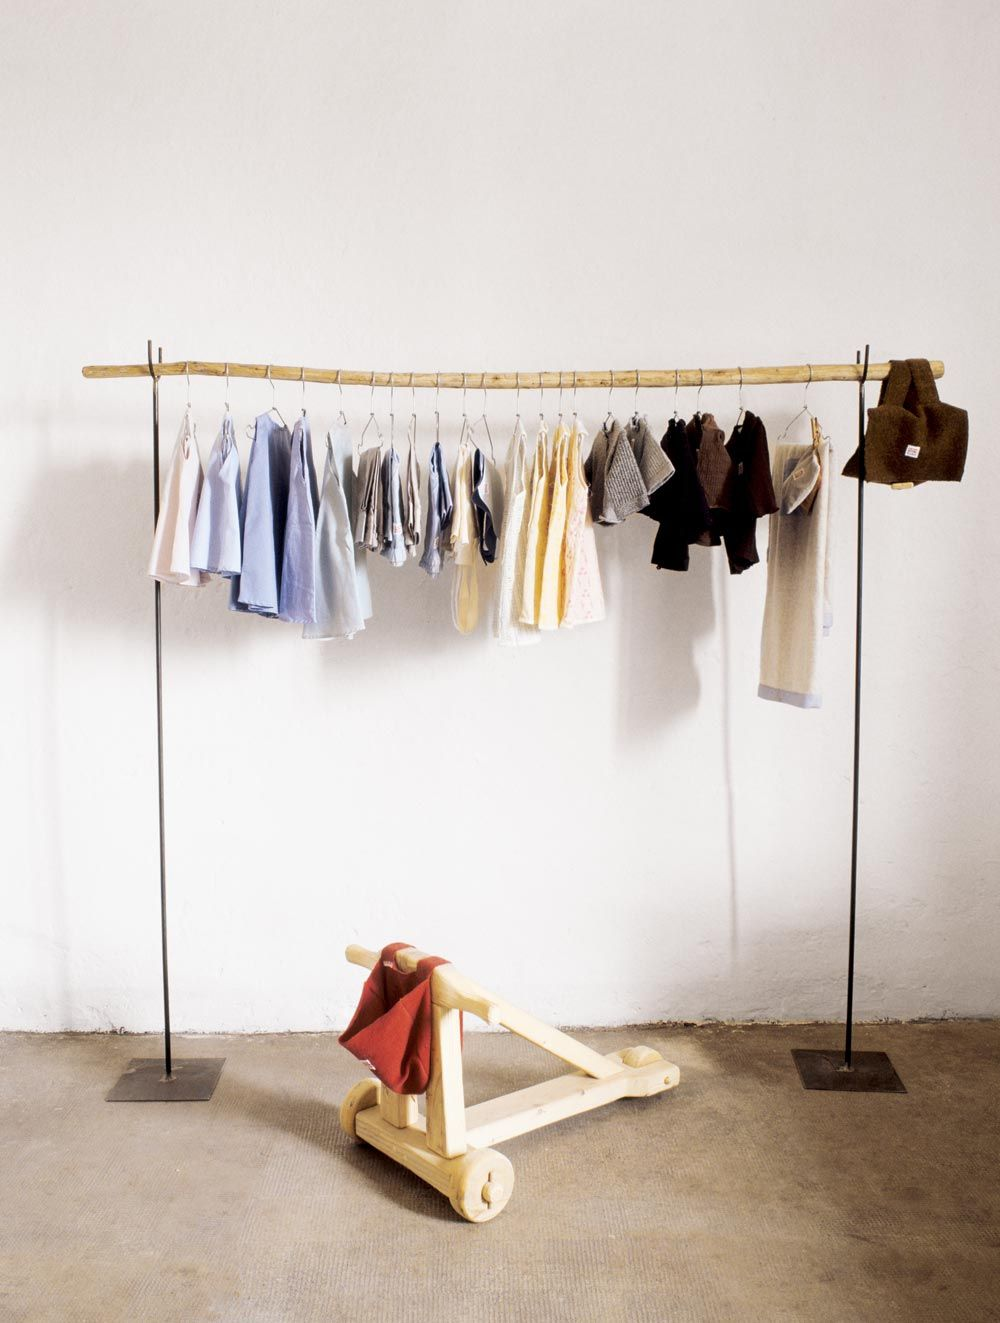 Bergame : Katrin Arens | Suspendu, Collection et Enfants